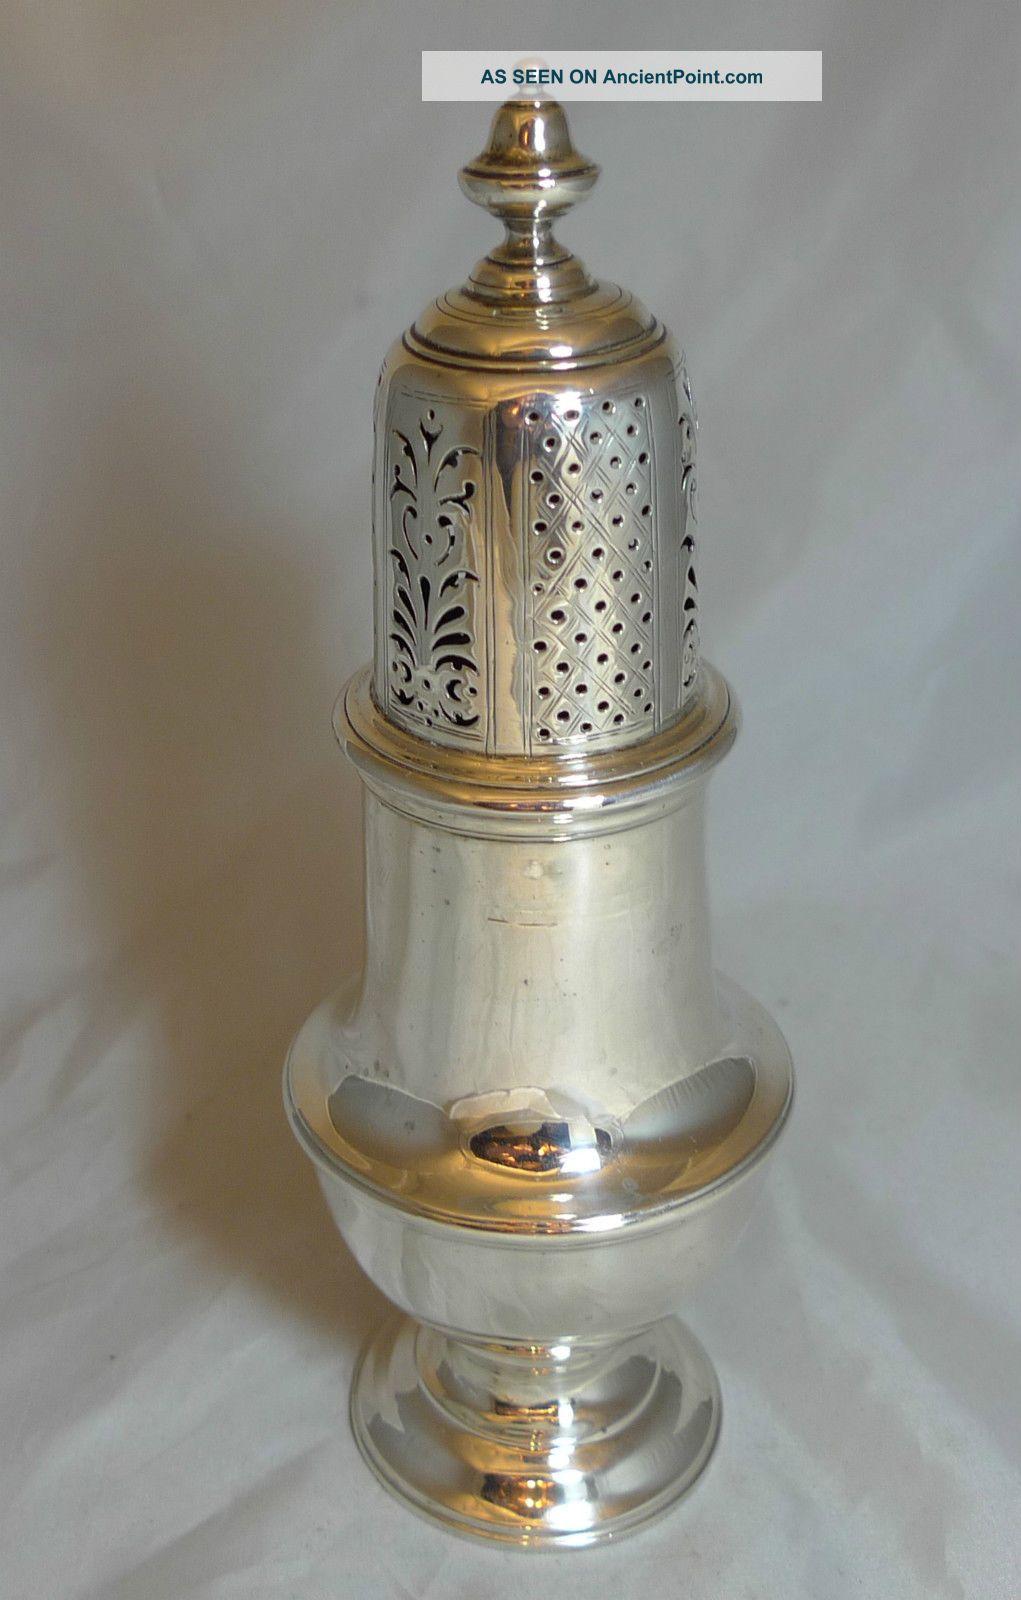 Art Deco Silver Sugar Shaker By Asprey 1918 227g 20cm Salt & Pepper Shakers photo